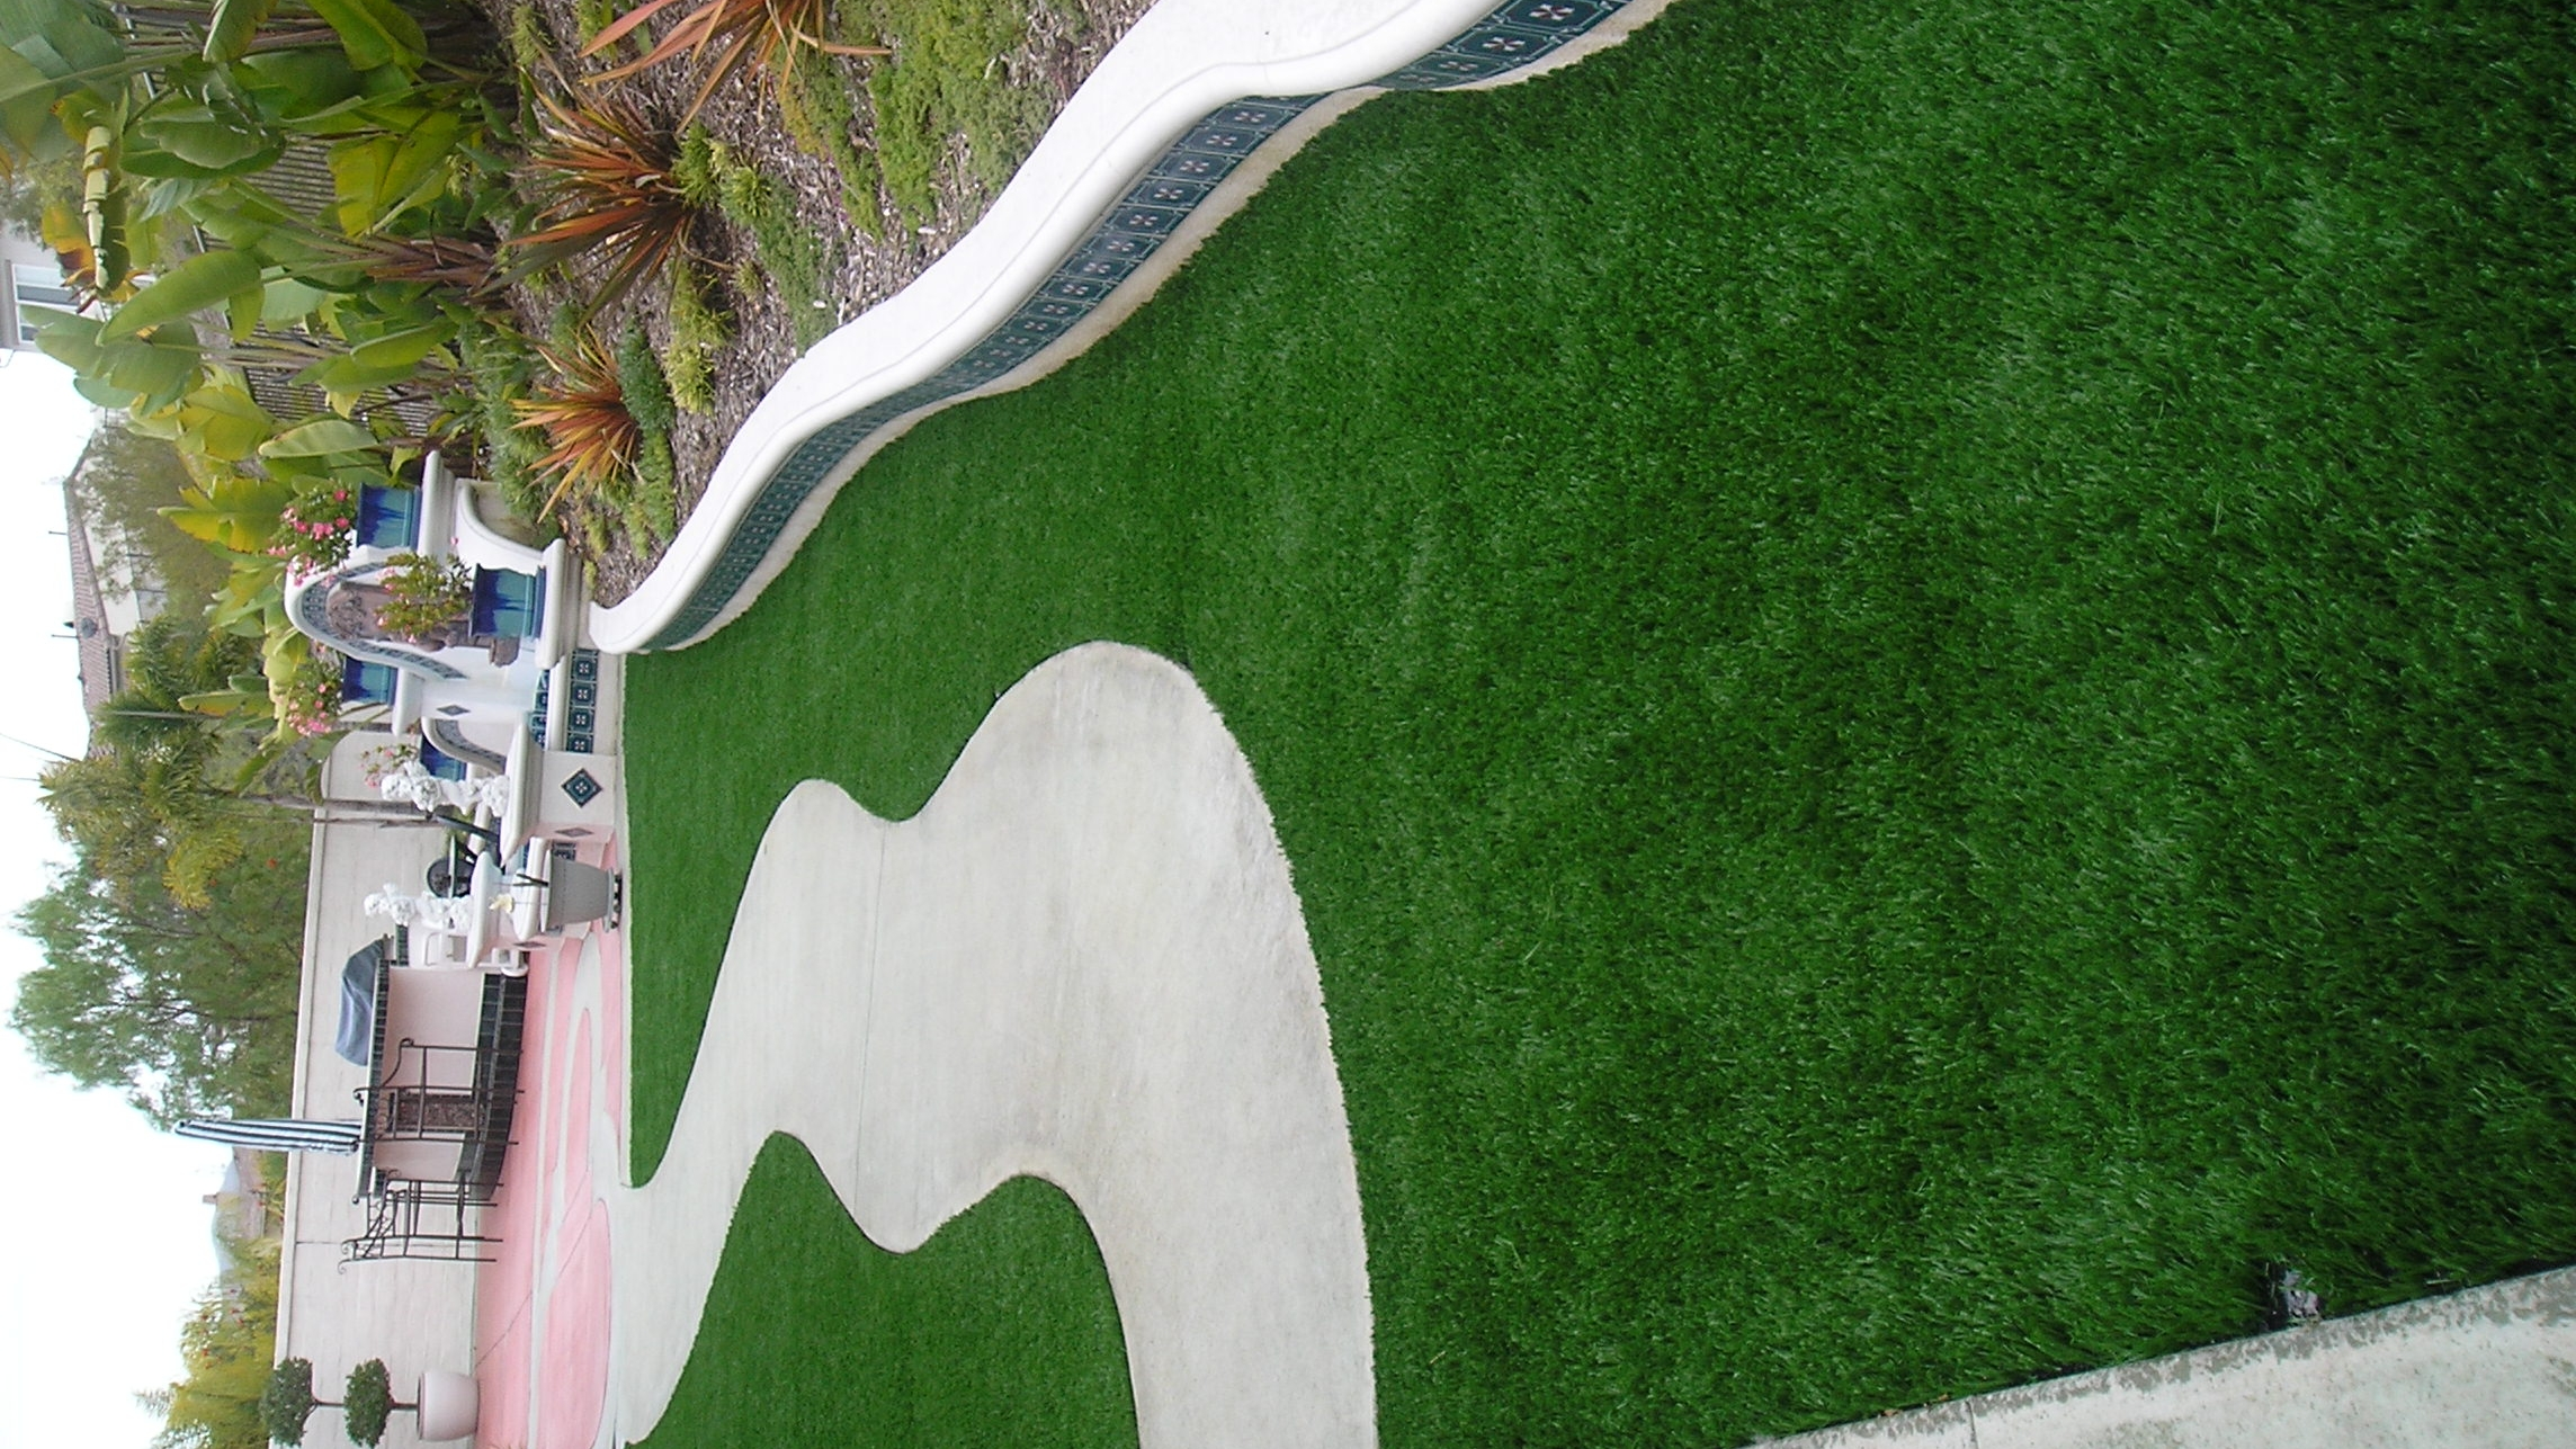 S Blade-90 artificial grass,artificial turf,artificial lawn,artificial grass rug,artificial grass installation,artificial grass,fake grass,synthetic grass,grass carpet,artificial grass rug